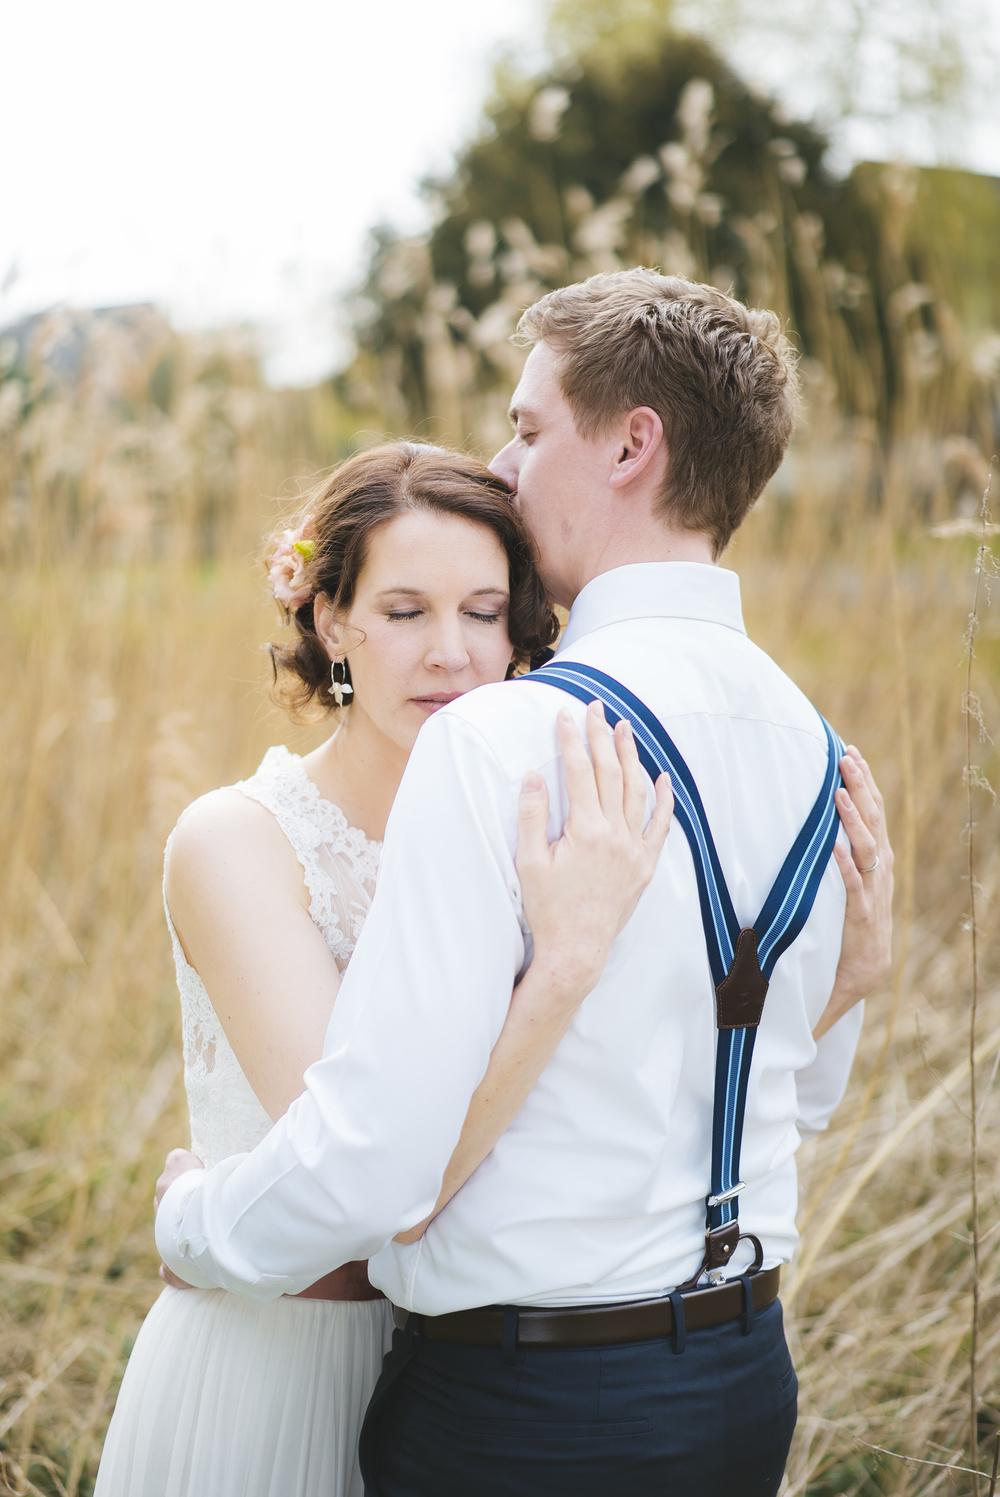 Hochzeitsfotograf-Schlossruine-Hertefeld-Weeze-027.jpg